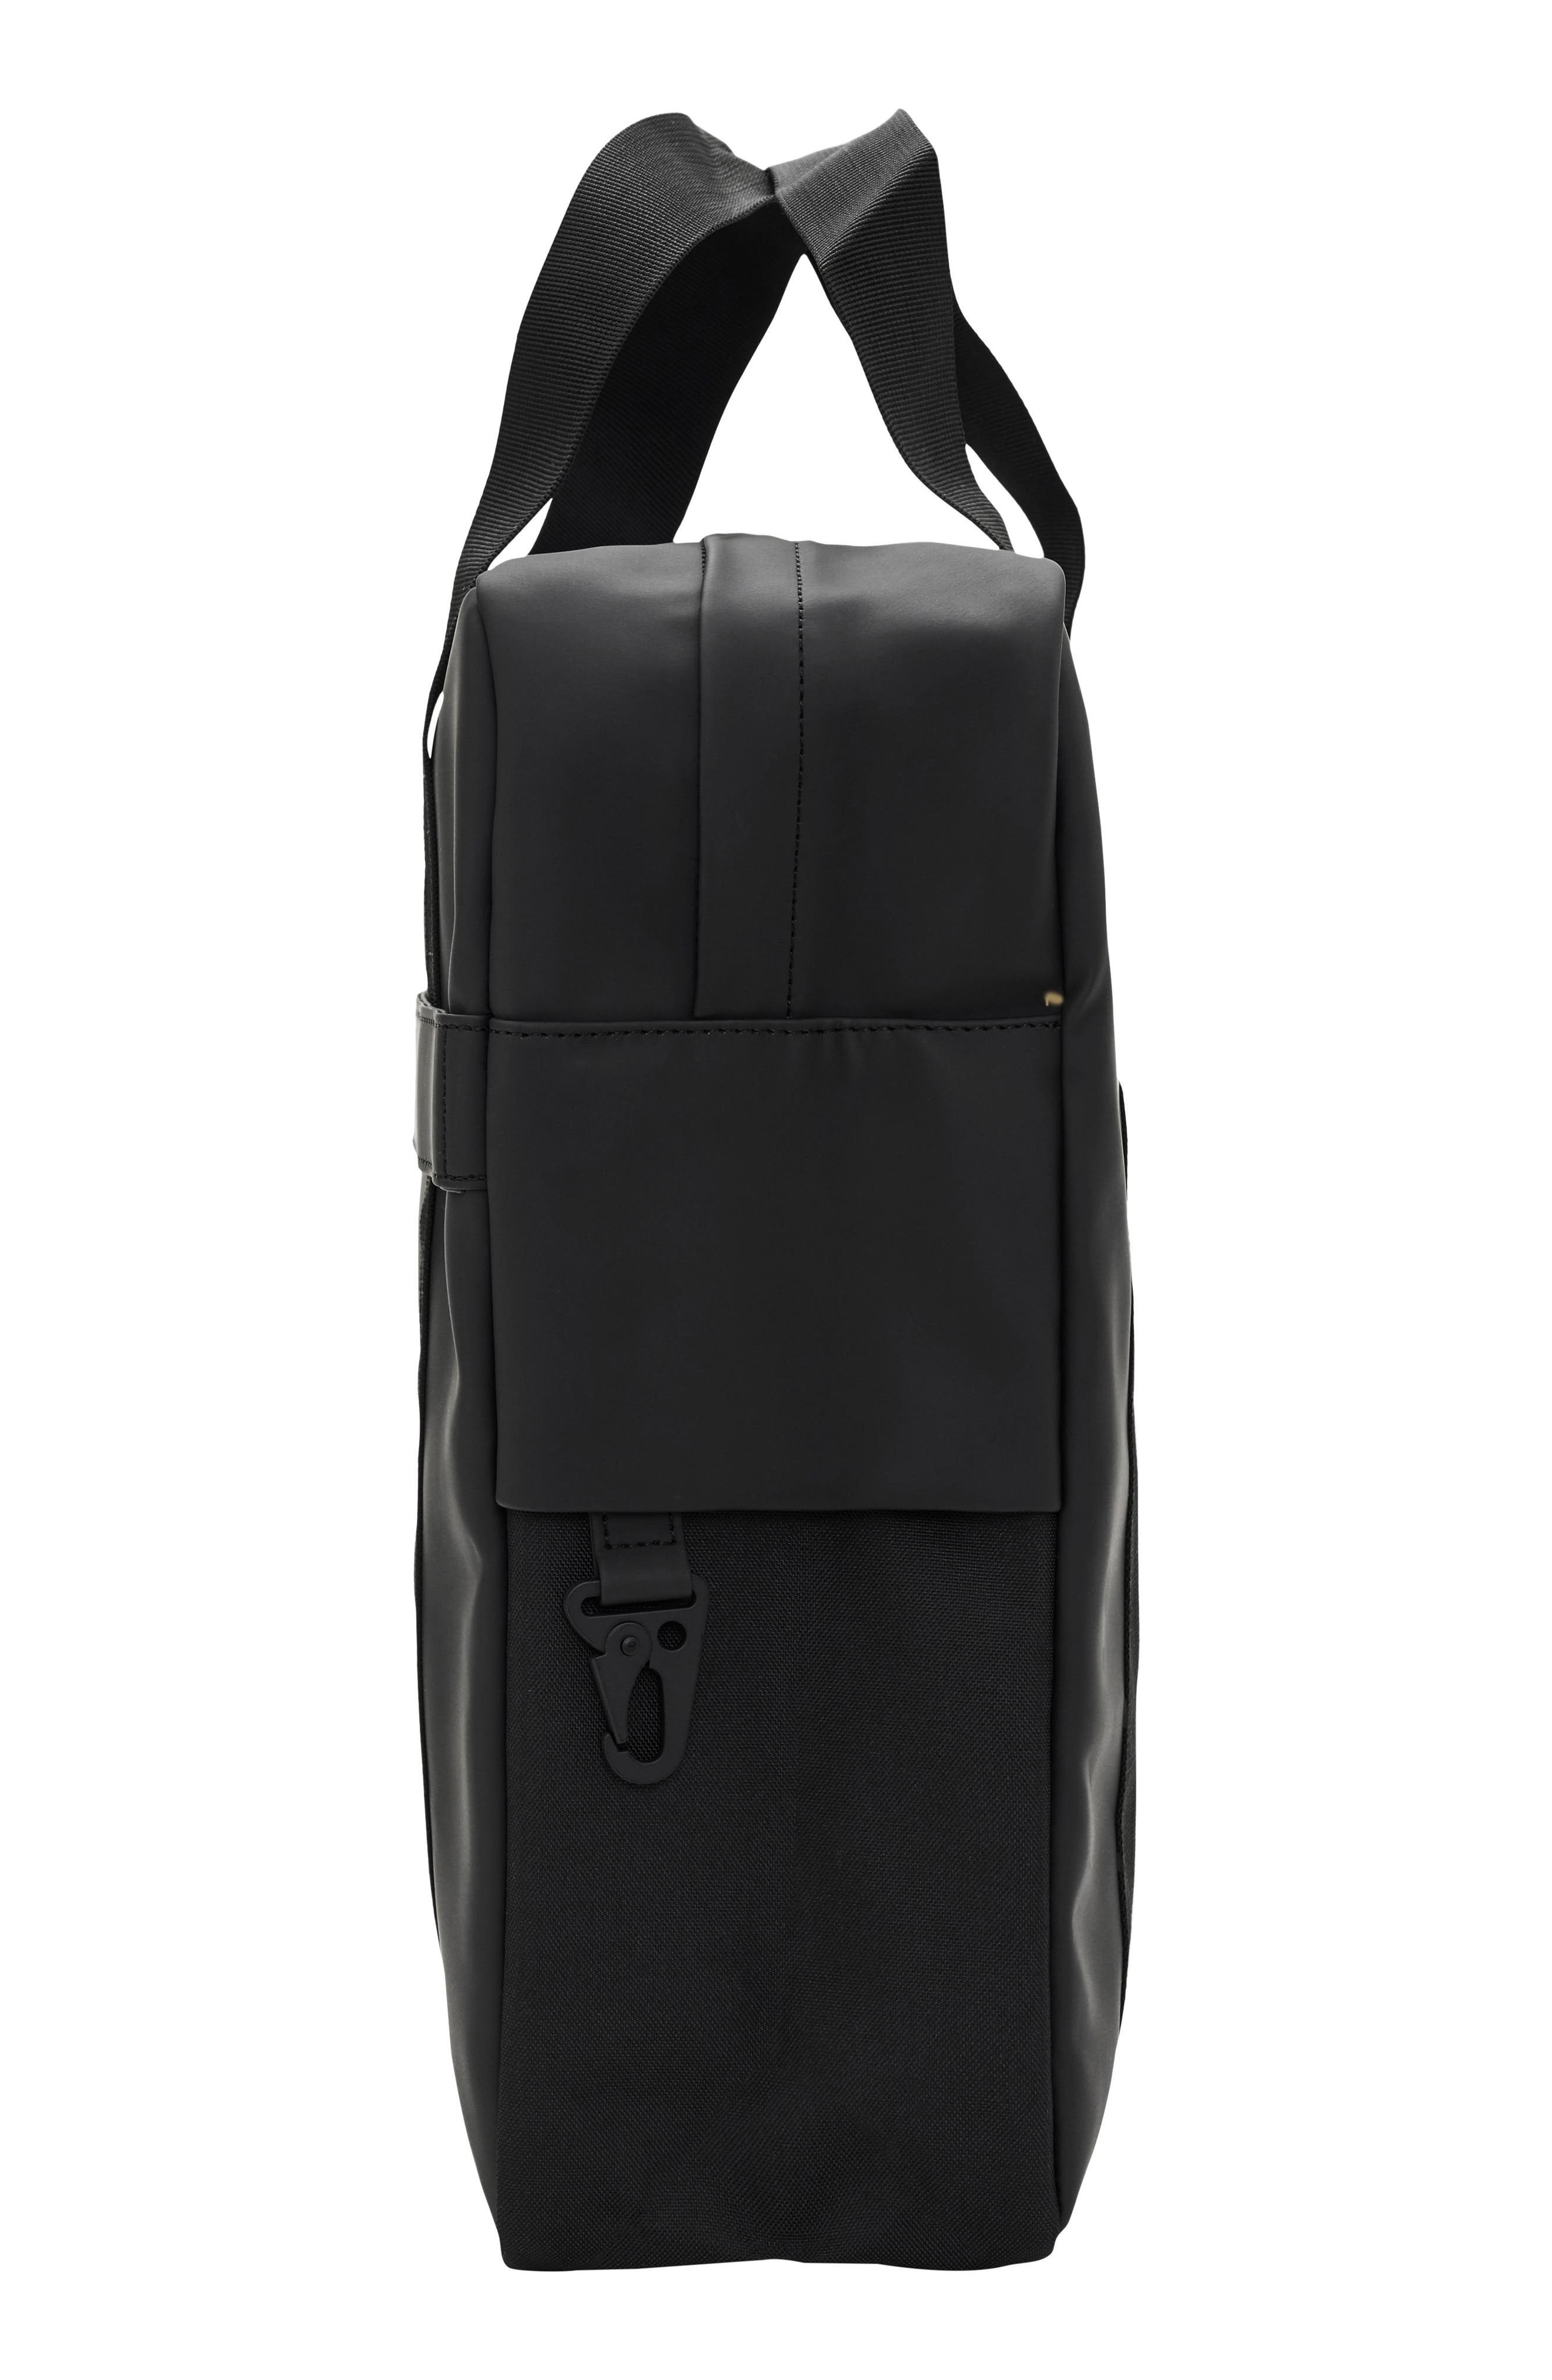 Waterproof Utility Tote Bag,                             Alternate thumbnail 2, color,                             Black